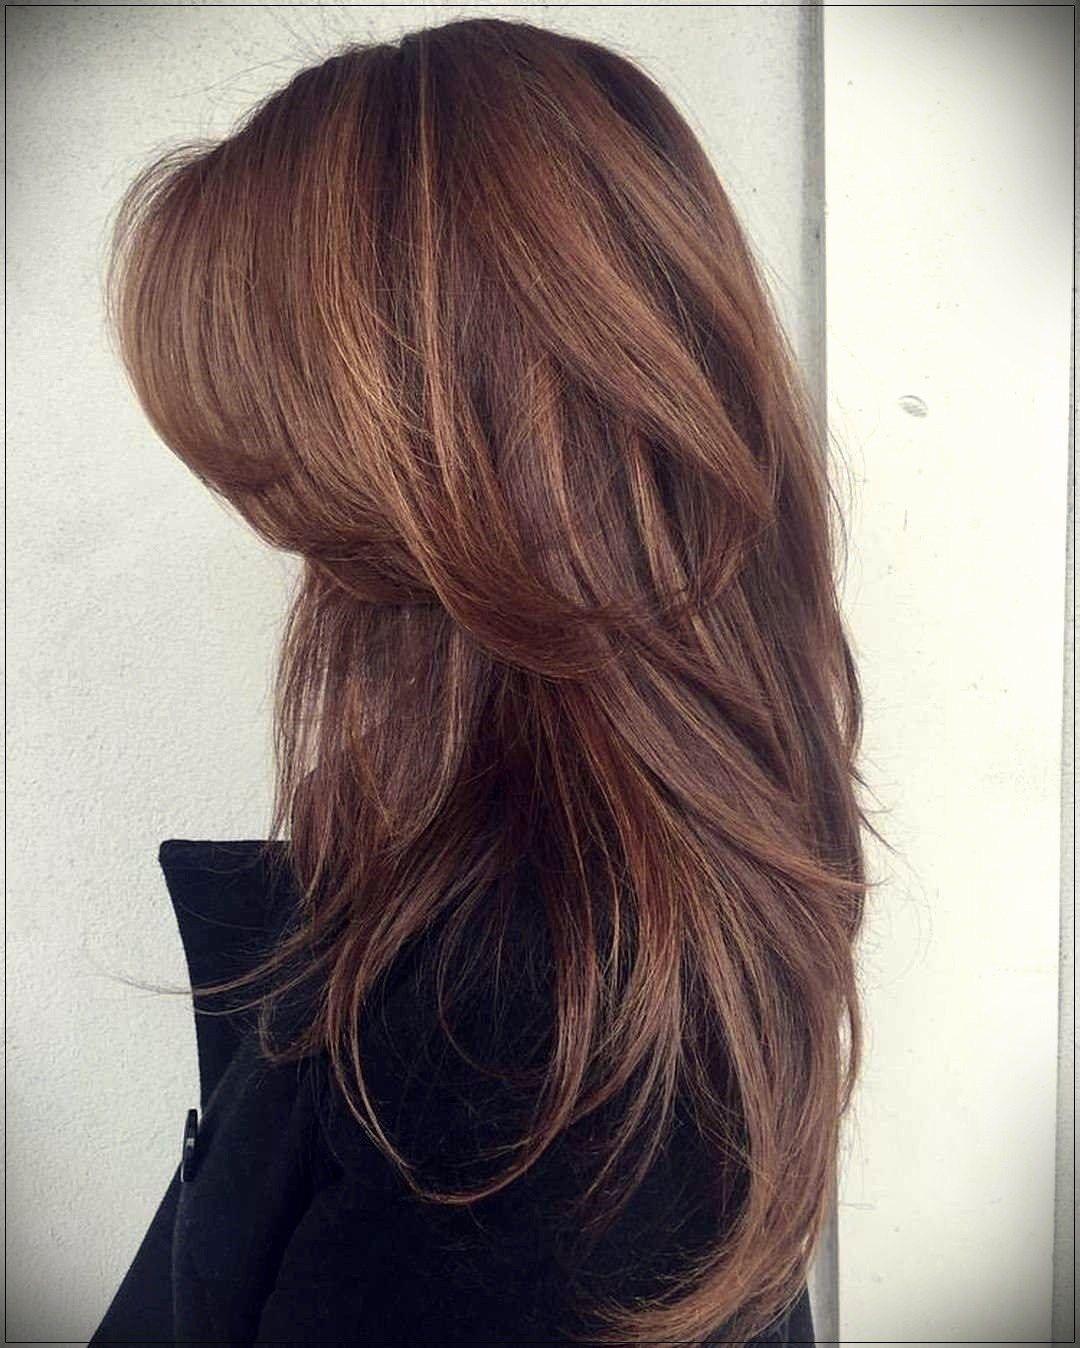 Trendy Haircut Waterfall 2019 Ideas For The Elegant Image Hair Styles Long Hair Styles Long Layered Hair